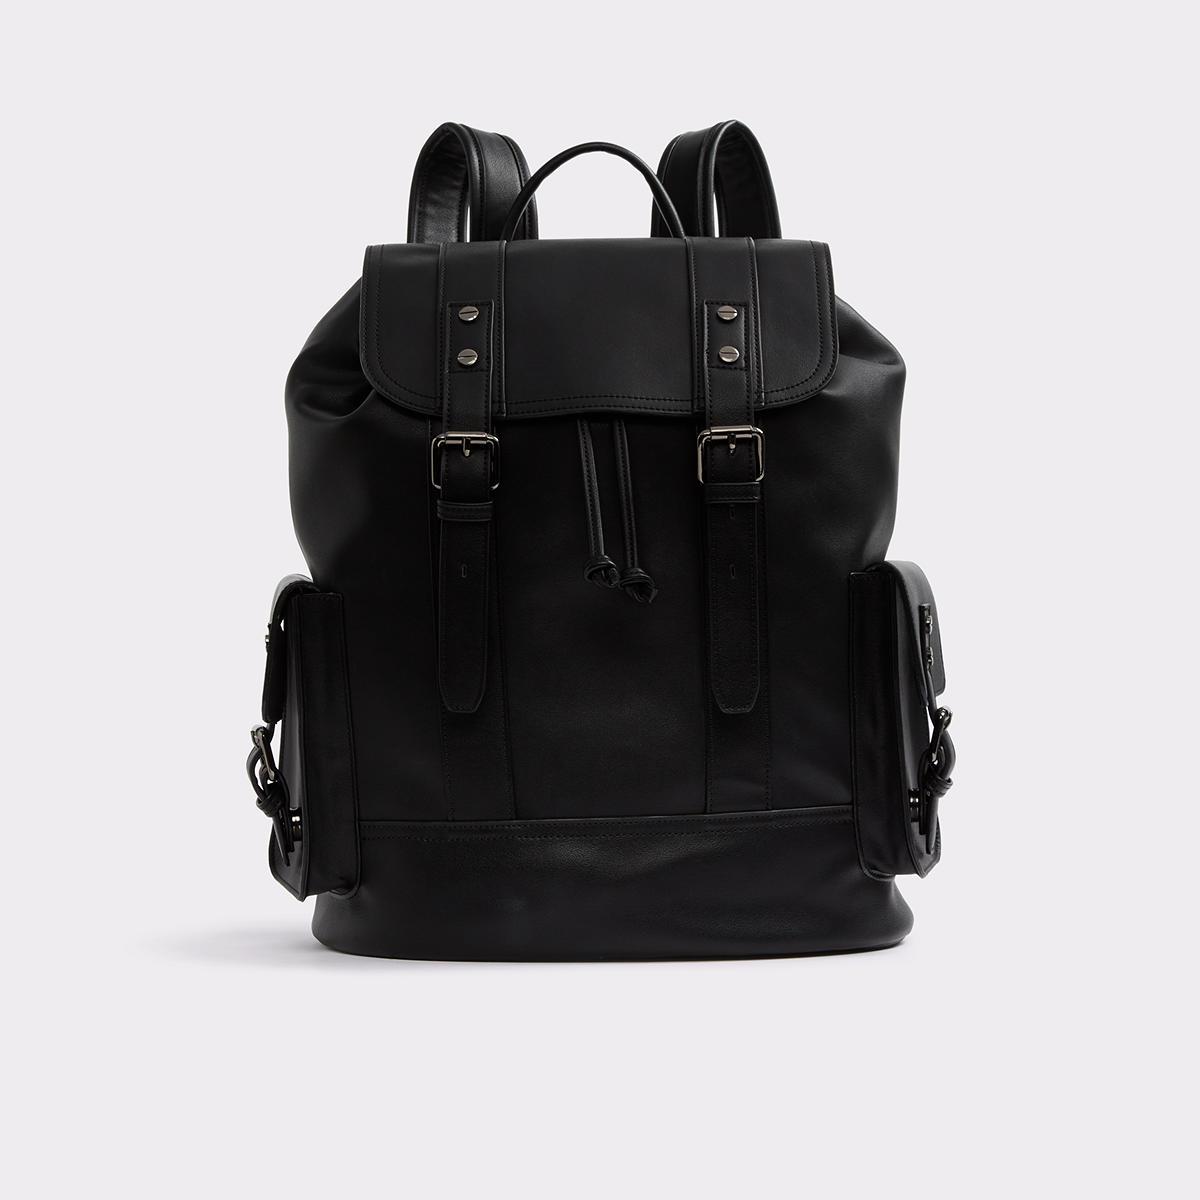 Callender Midnight Black Men's Bags & wallets | ALDO US at Aldo Shoes in Victor, NY | Tuggl